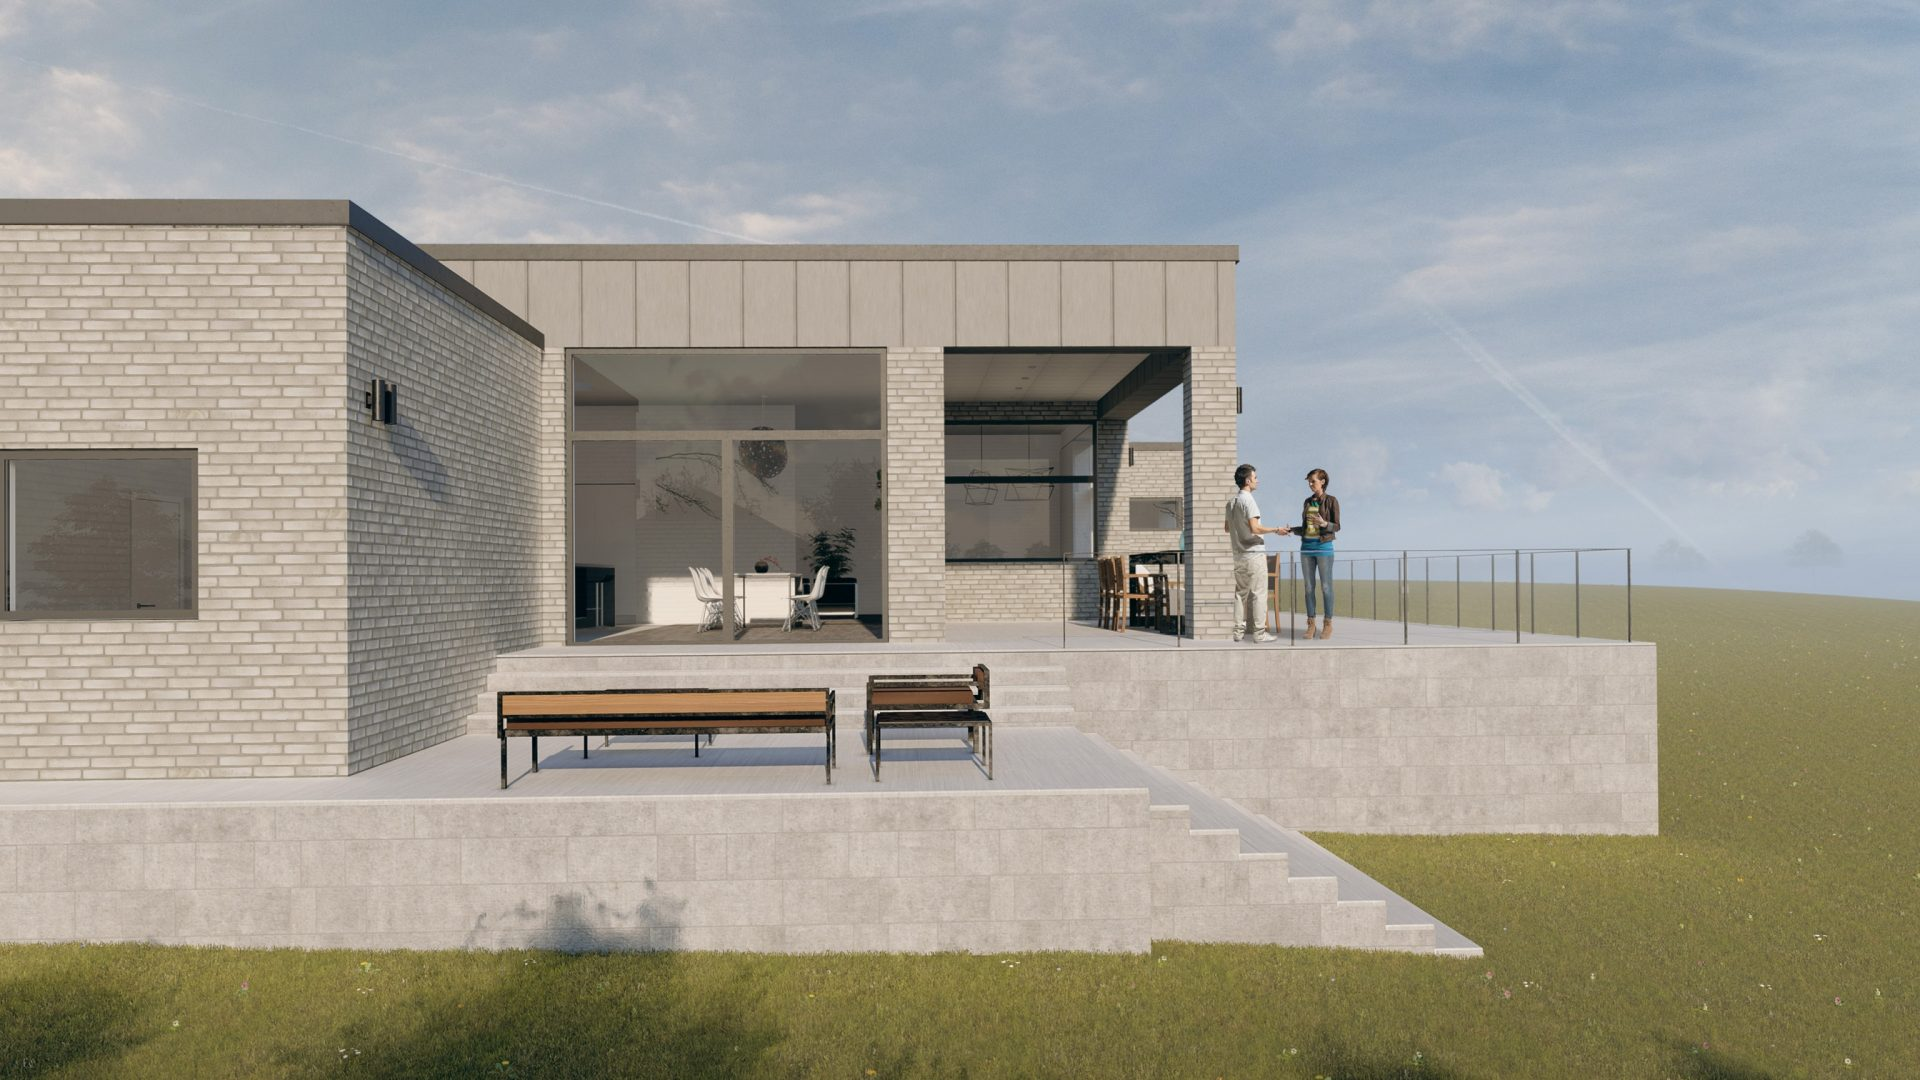 Nyt hus i støvring 04